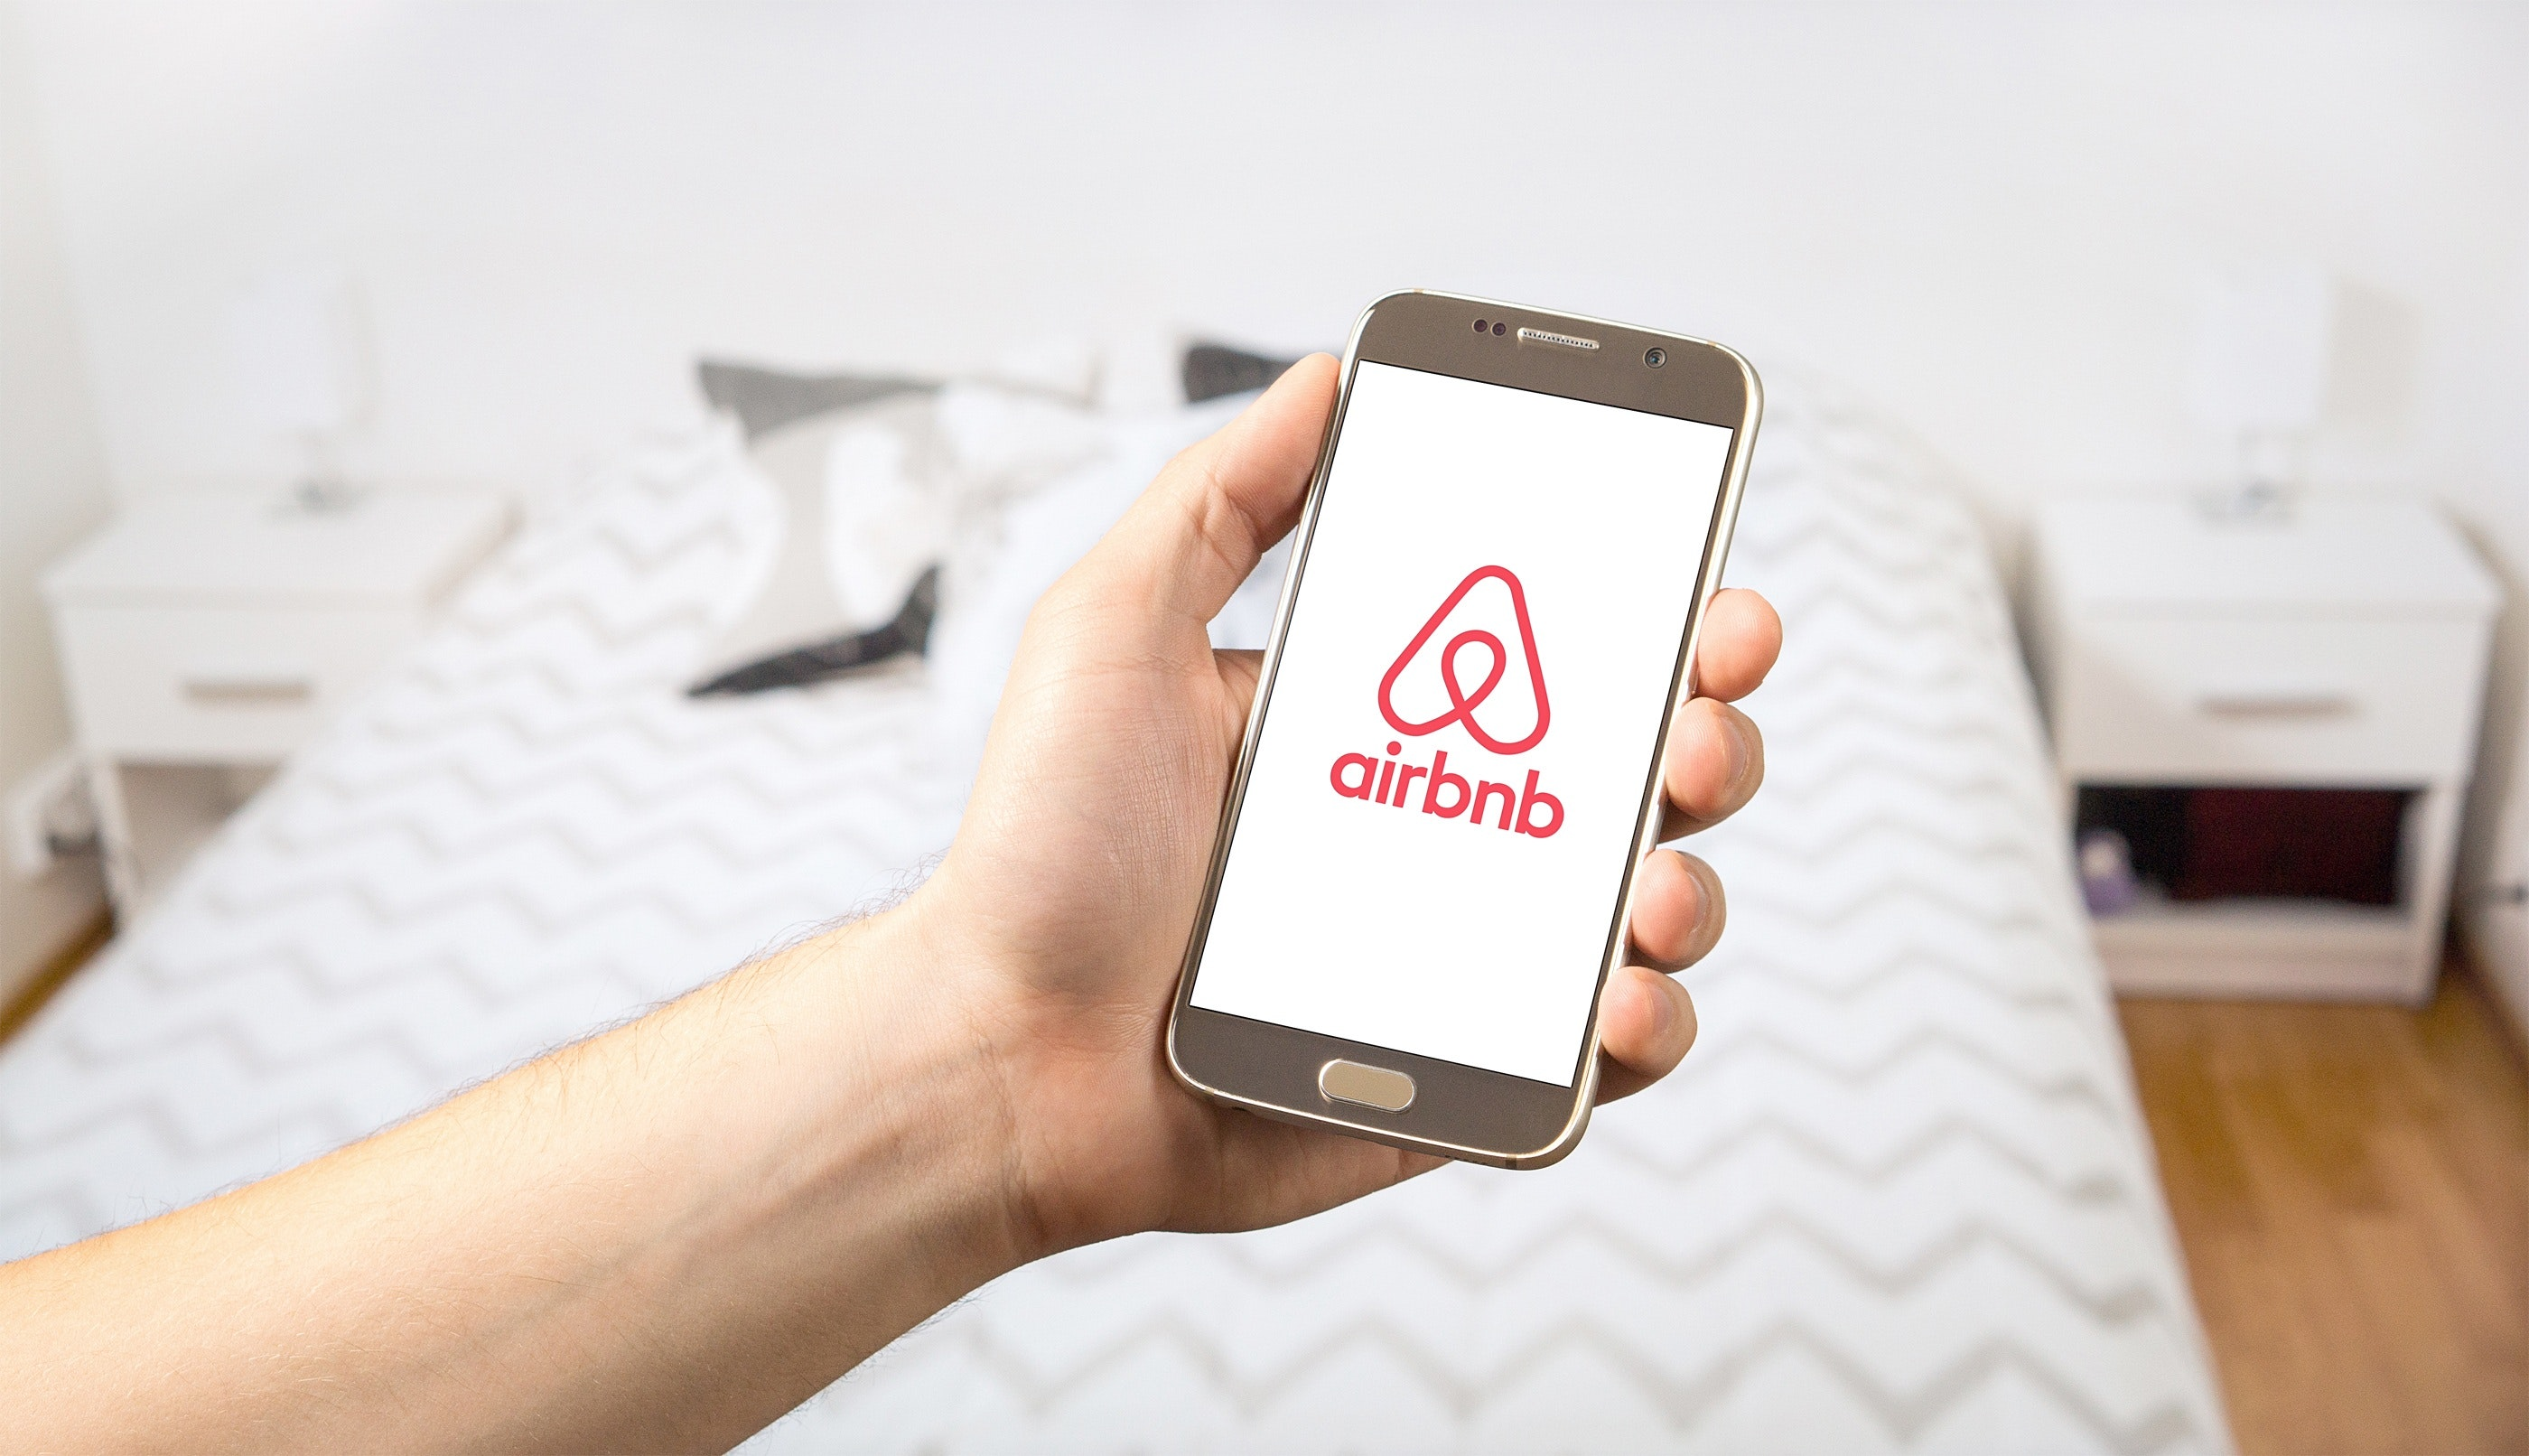 New year brings new Airbnb tax in Waterloo Region